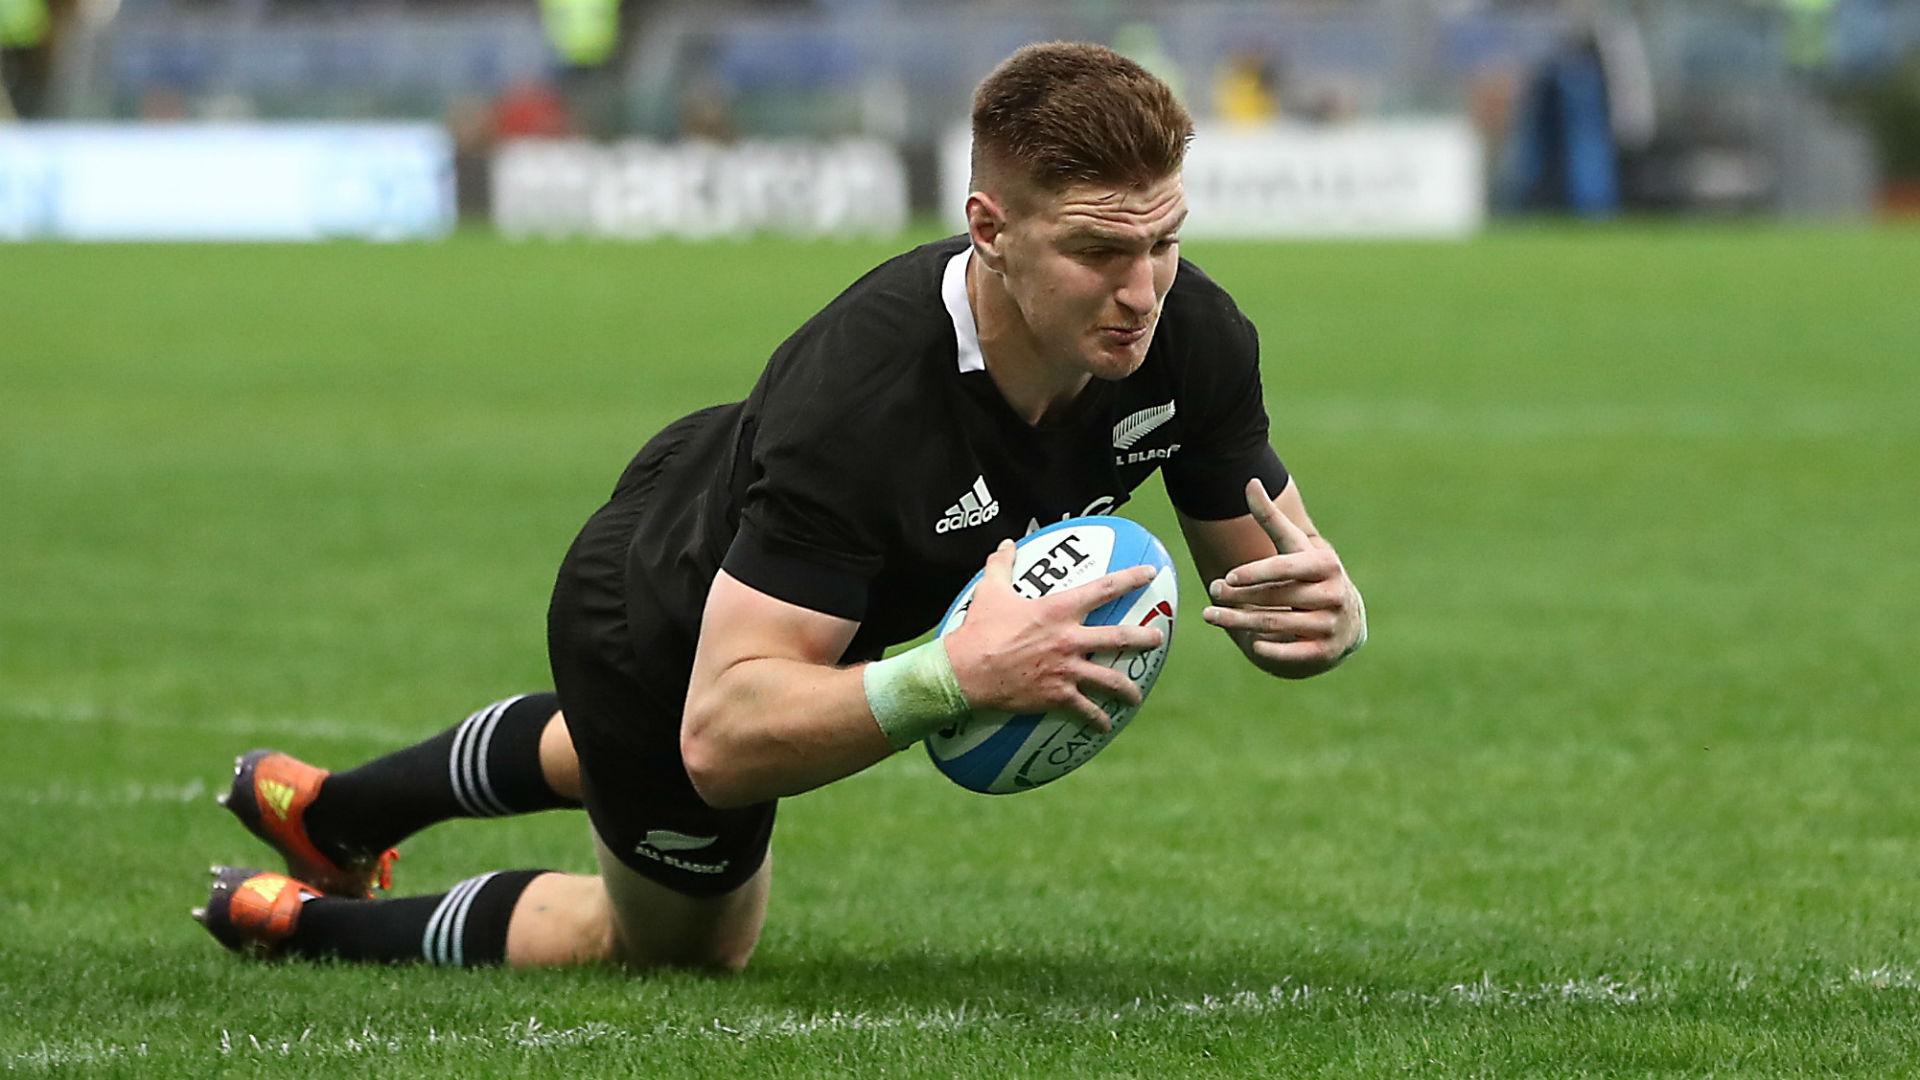 All Blacks demolish Italy after Jordie Barrett's four-try haul